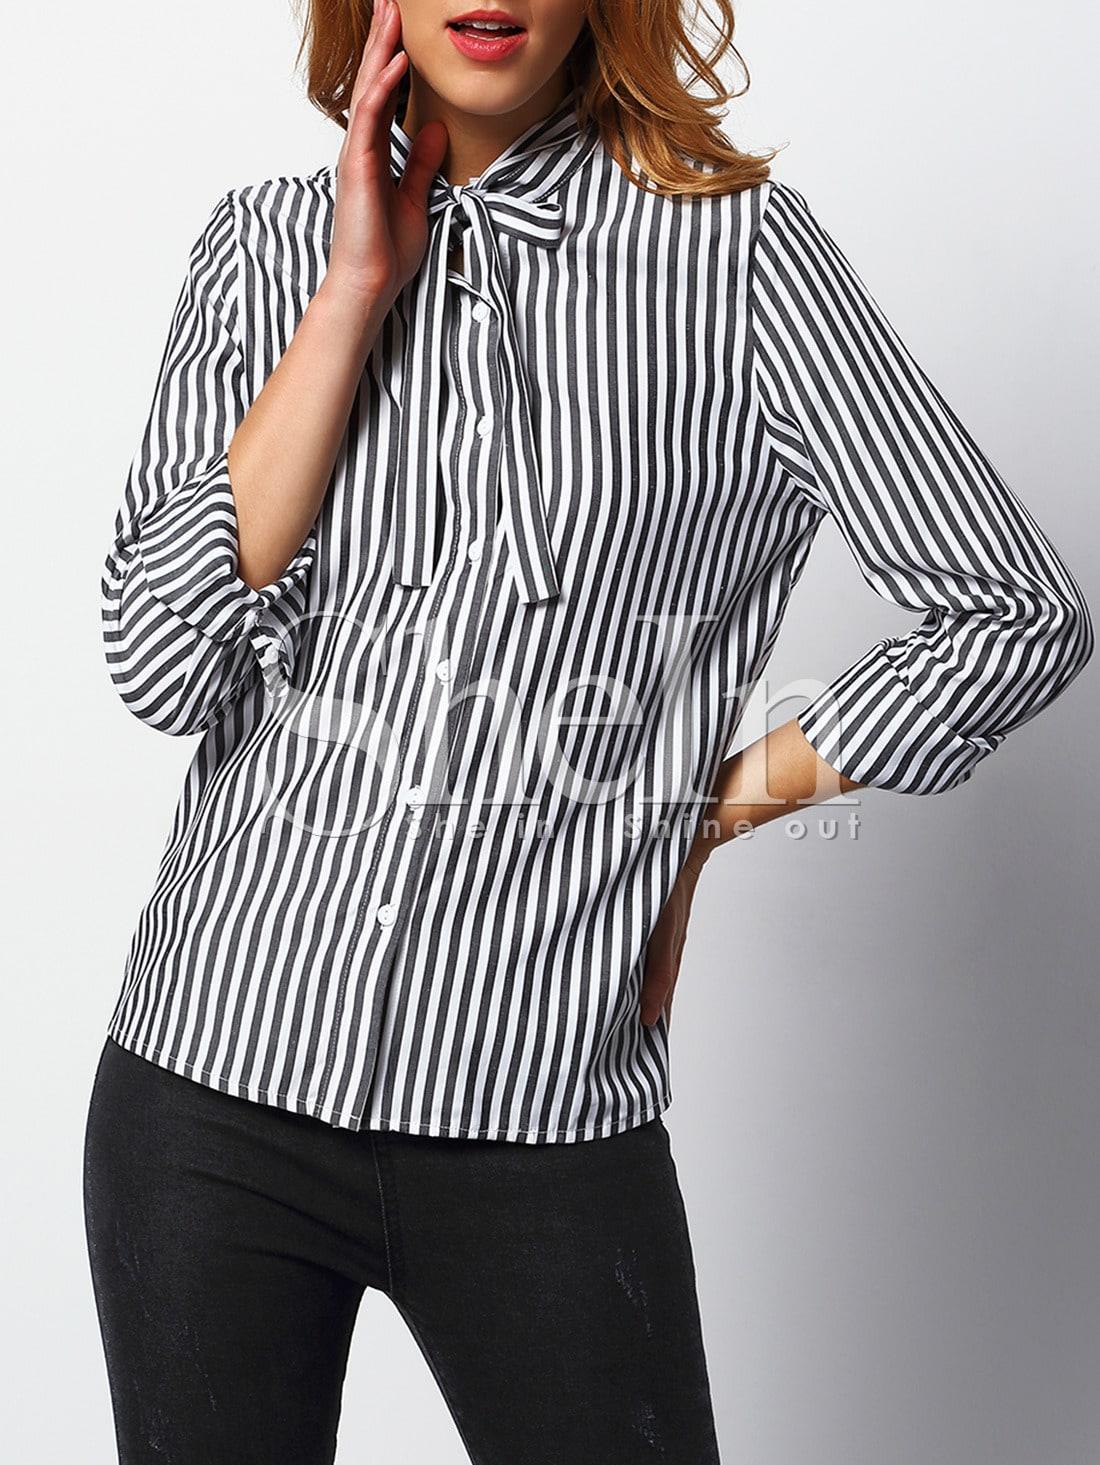 Women Black White Vertical Striped Shirt -SheIn(Sheinside)